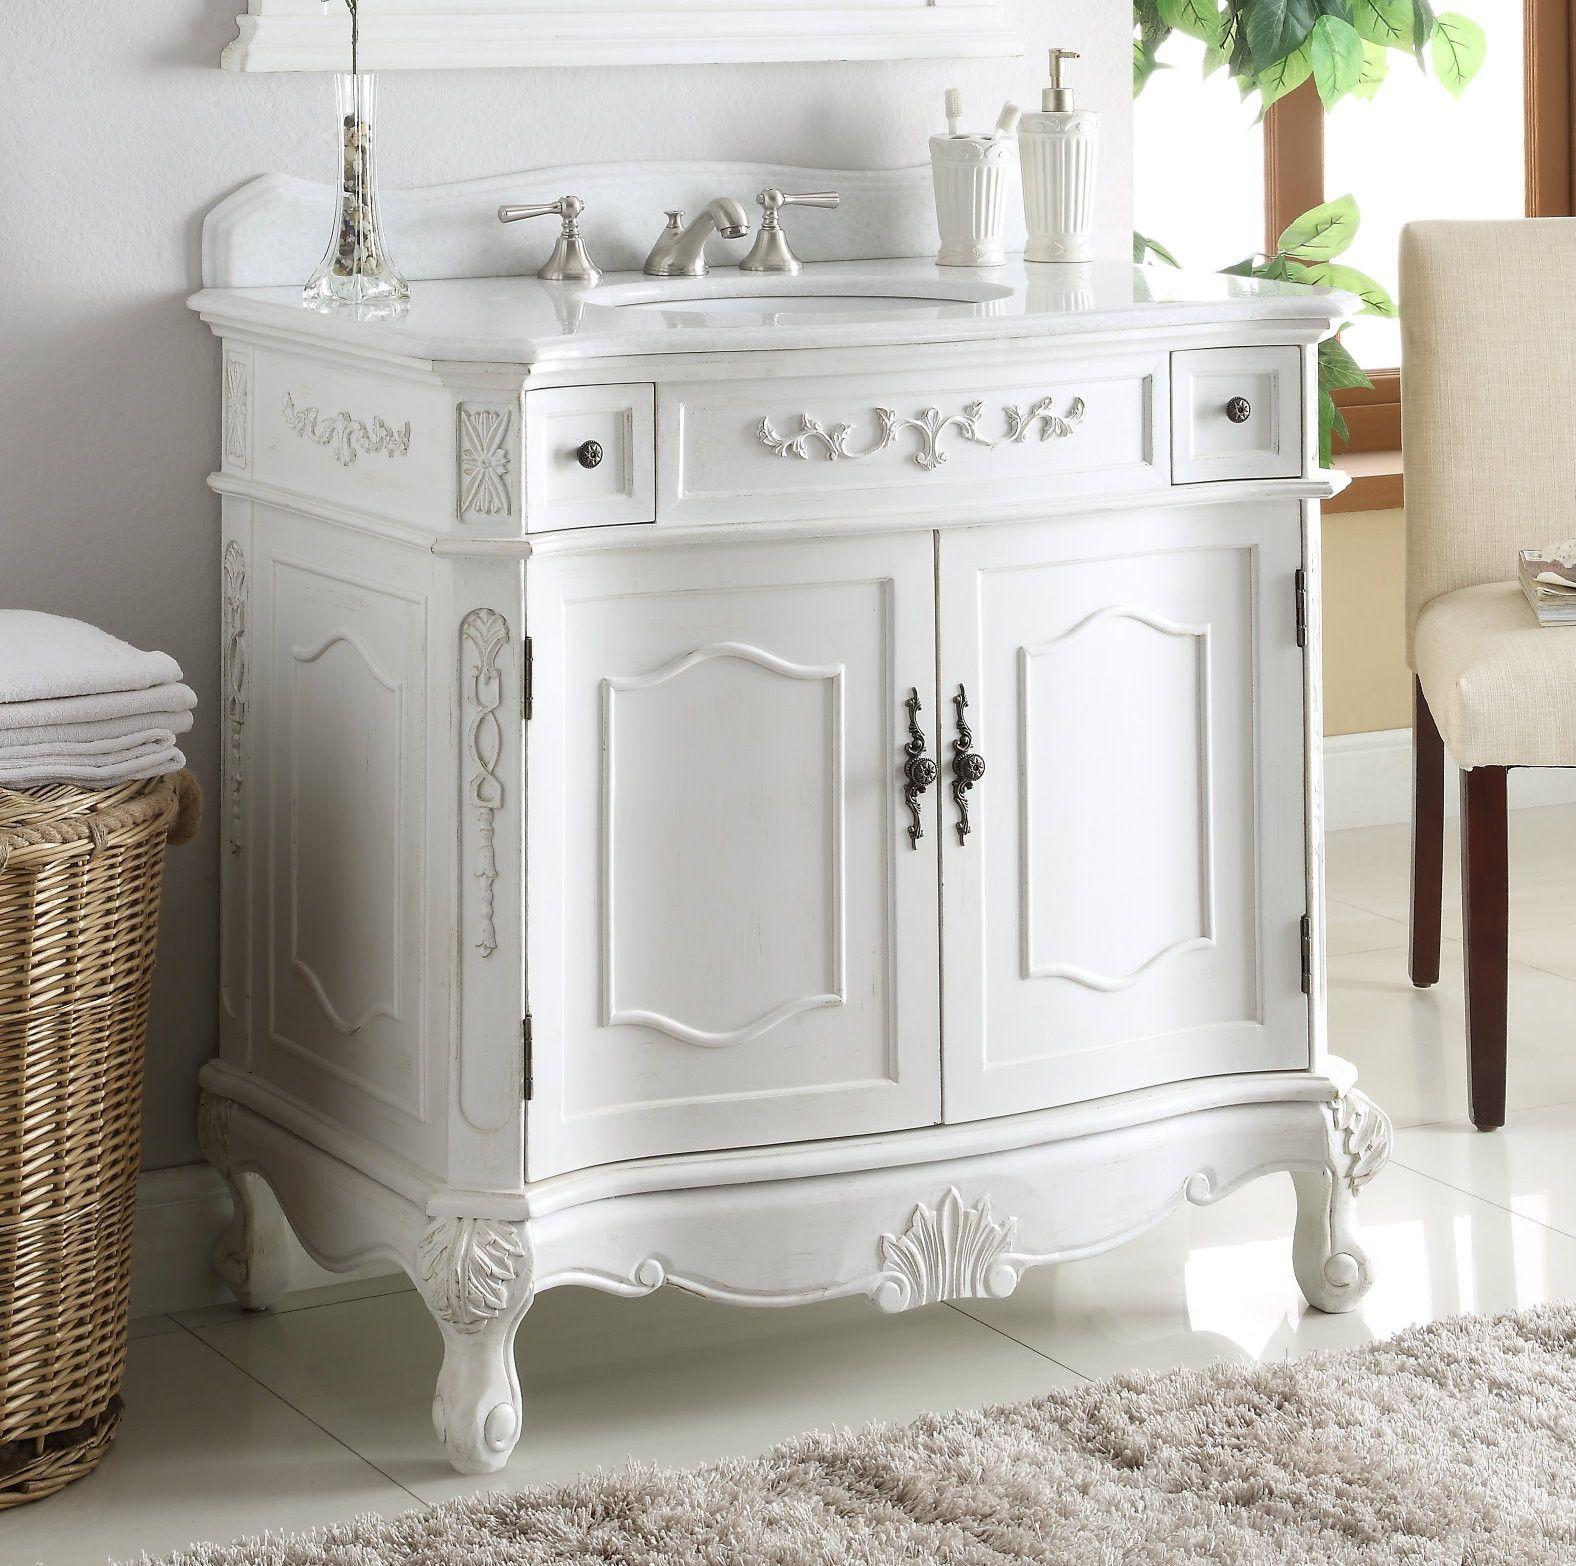 36 Clic Style Antique White Fairmont Bathroom Sink Vanity Bc 3905w Aw